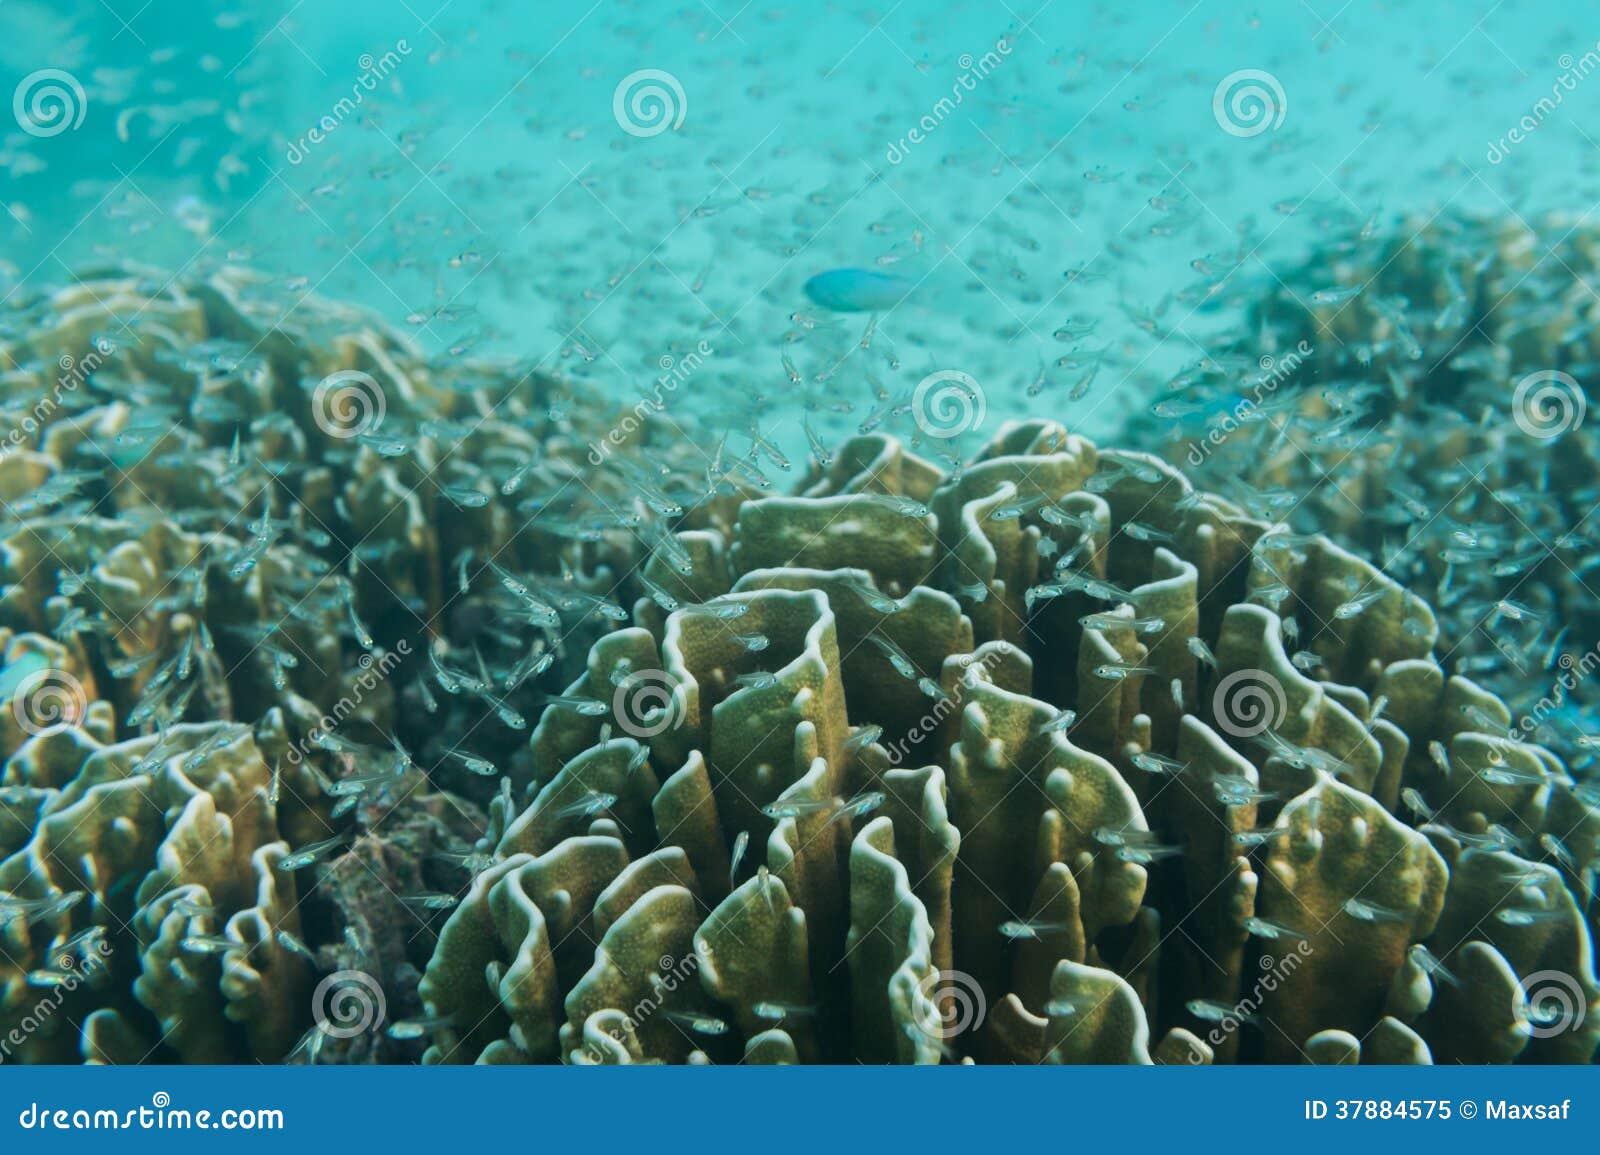 School of fish swimming near coral stock image for Little fish swim school